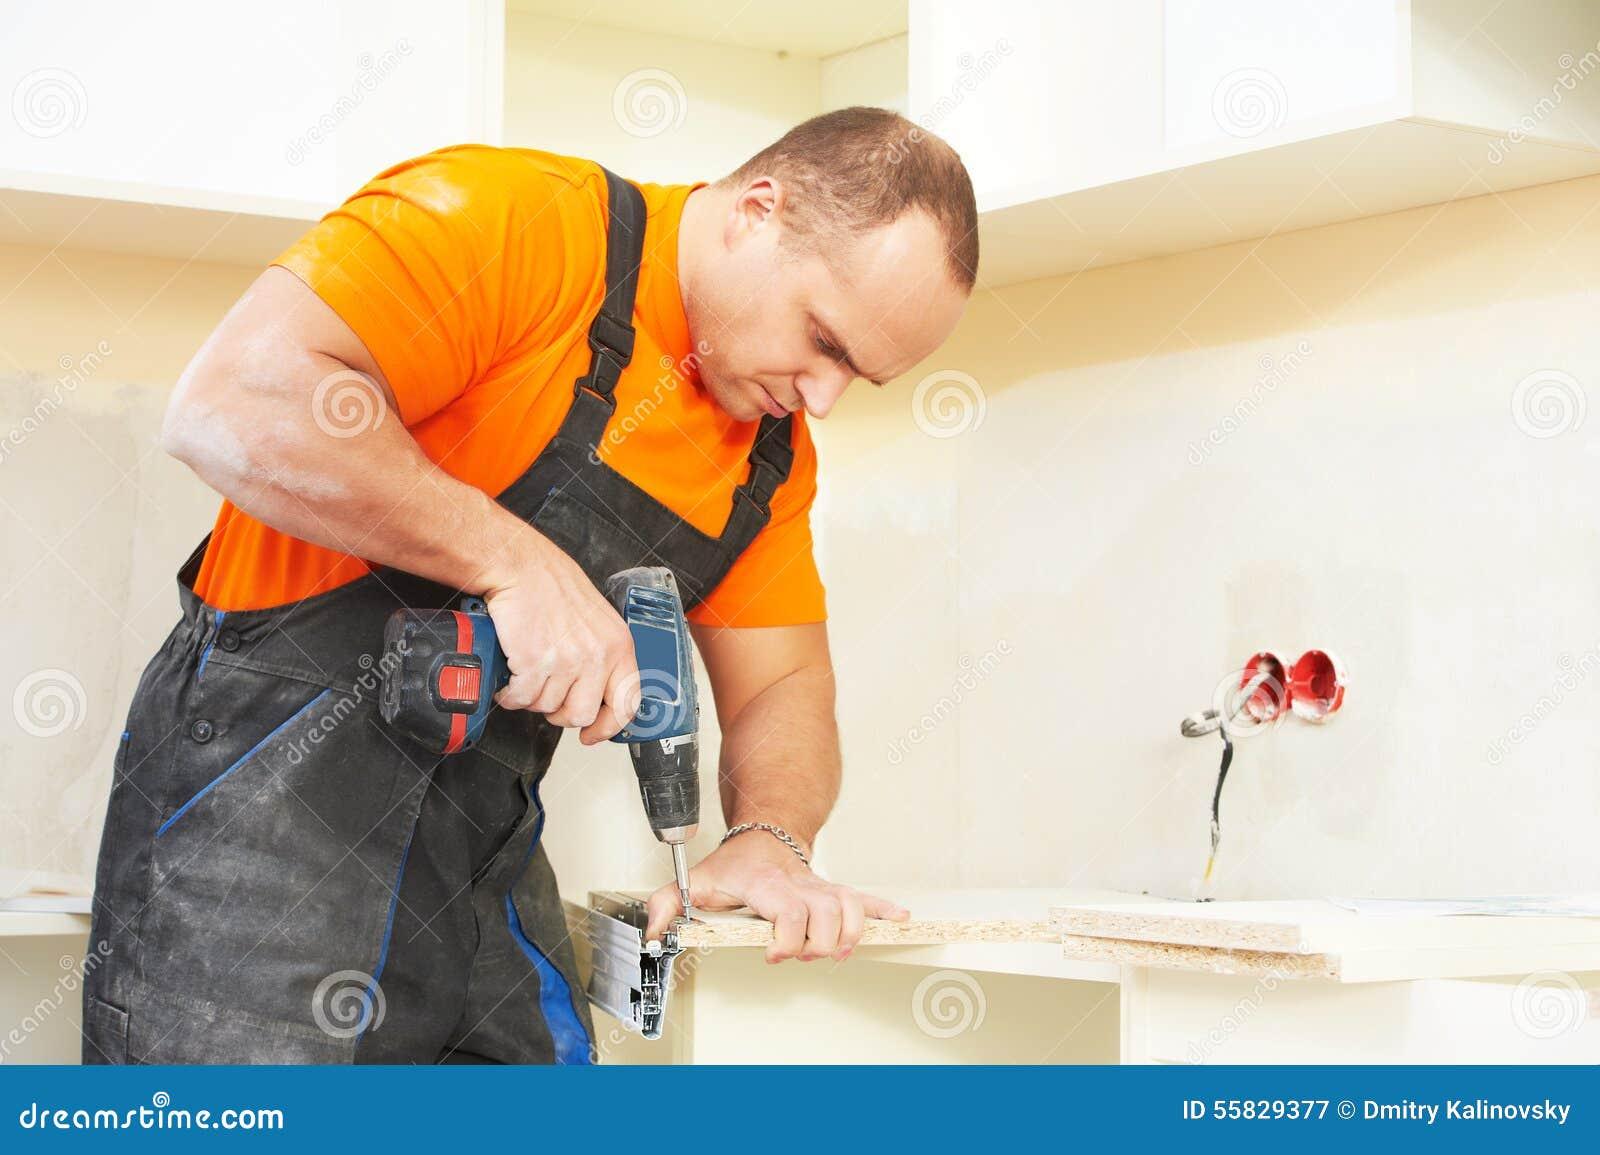 Kitchen Installer At Carpenter Work Stock Image - Image of cabinet ...